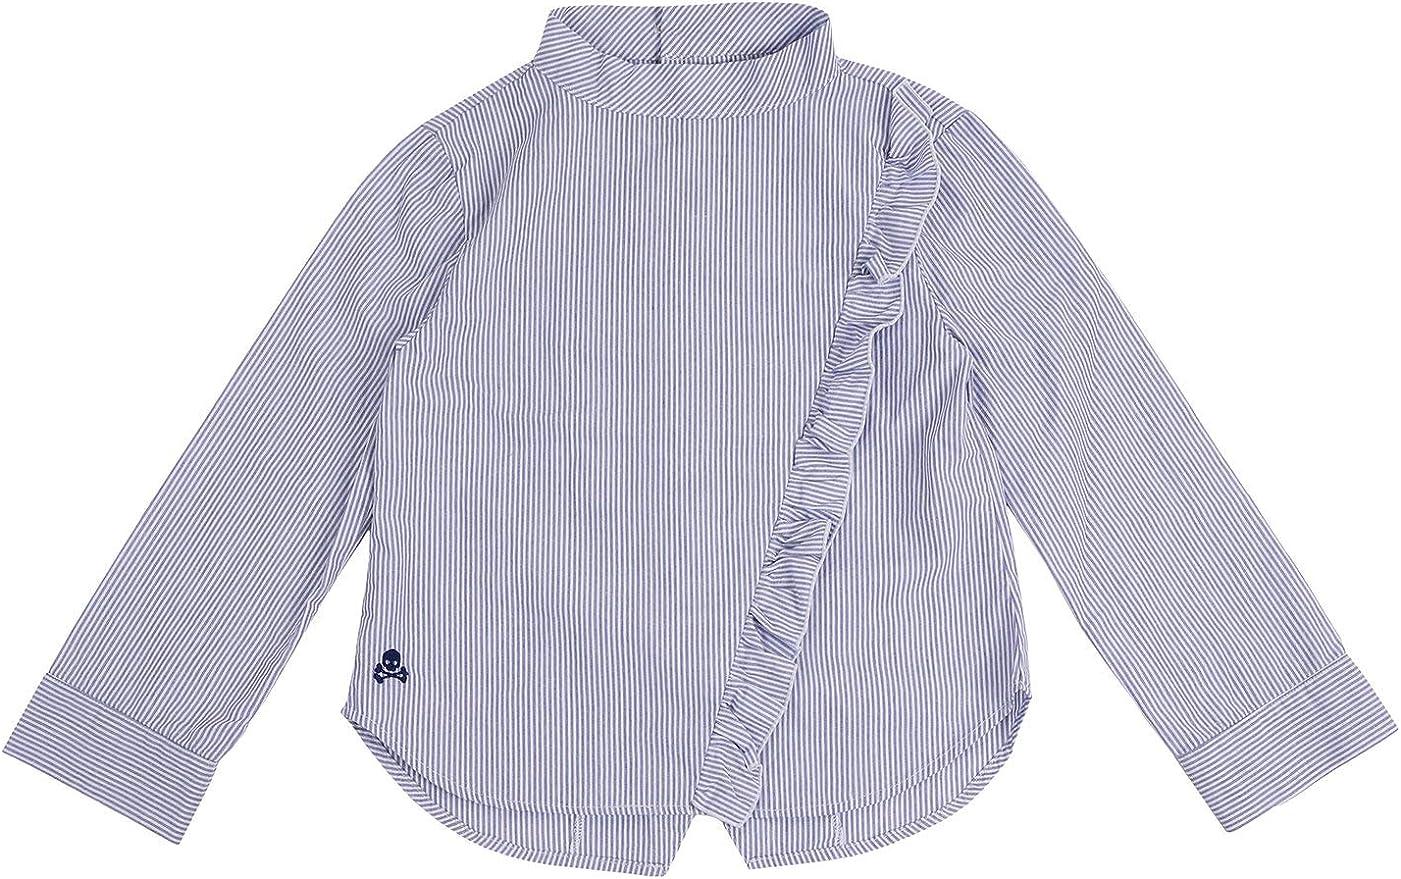 Scalpers Camisa Mao Volantes - Blue / 4: Amazon.es: Ropa